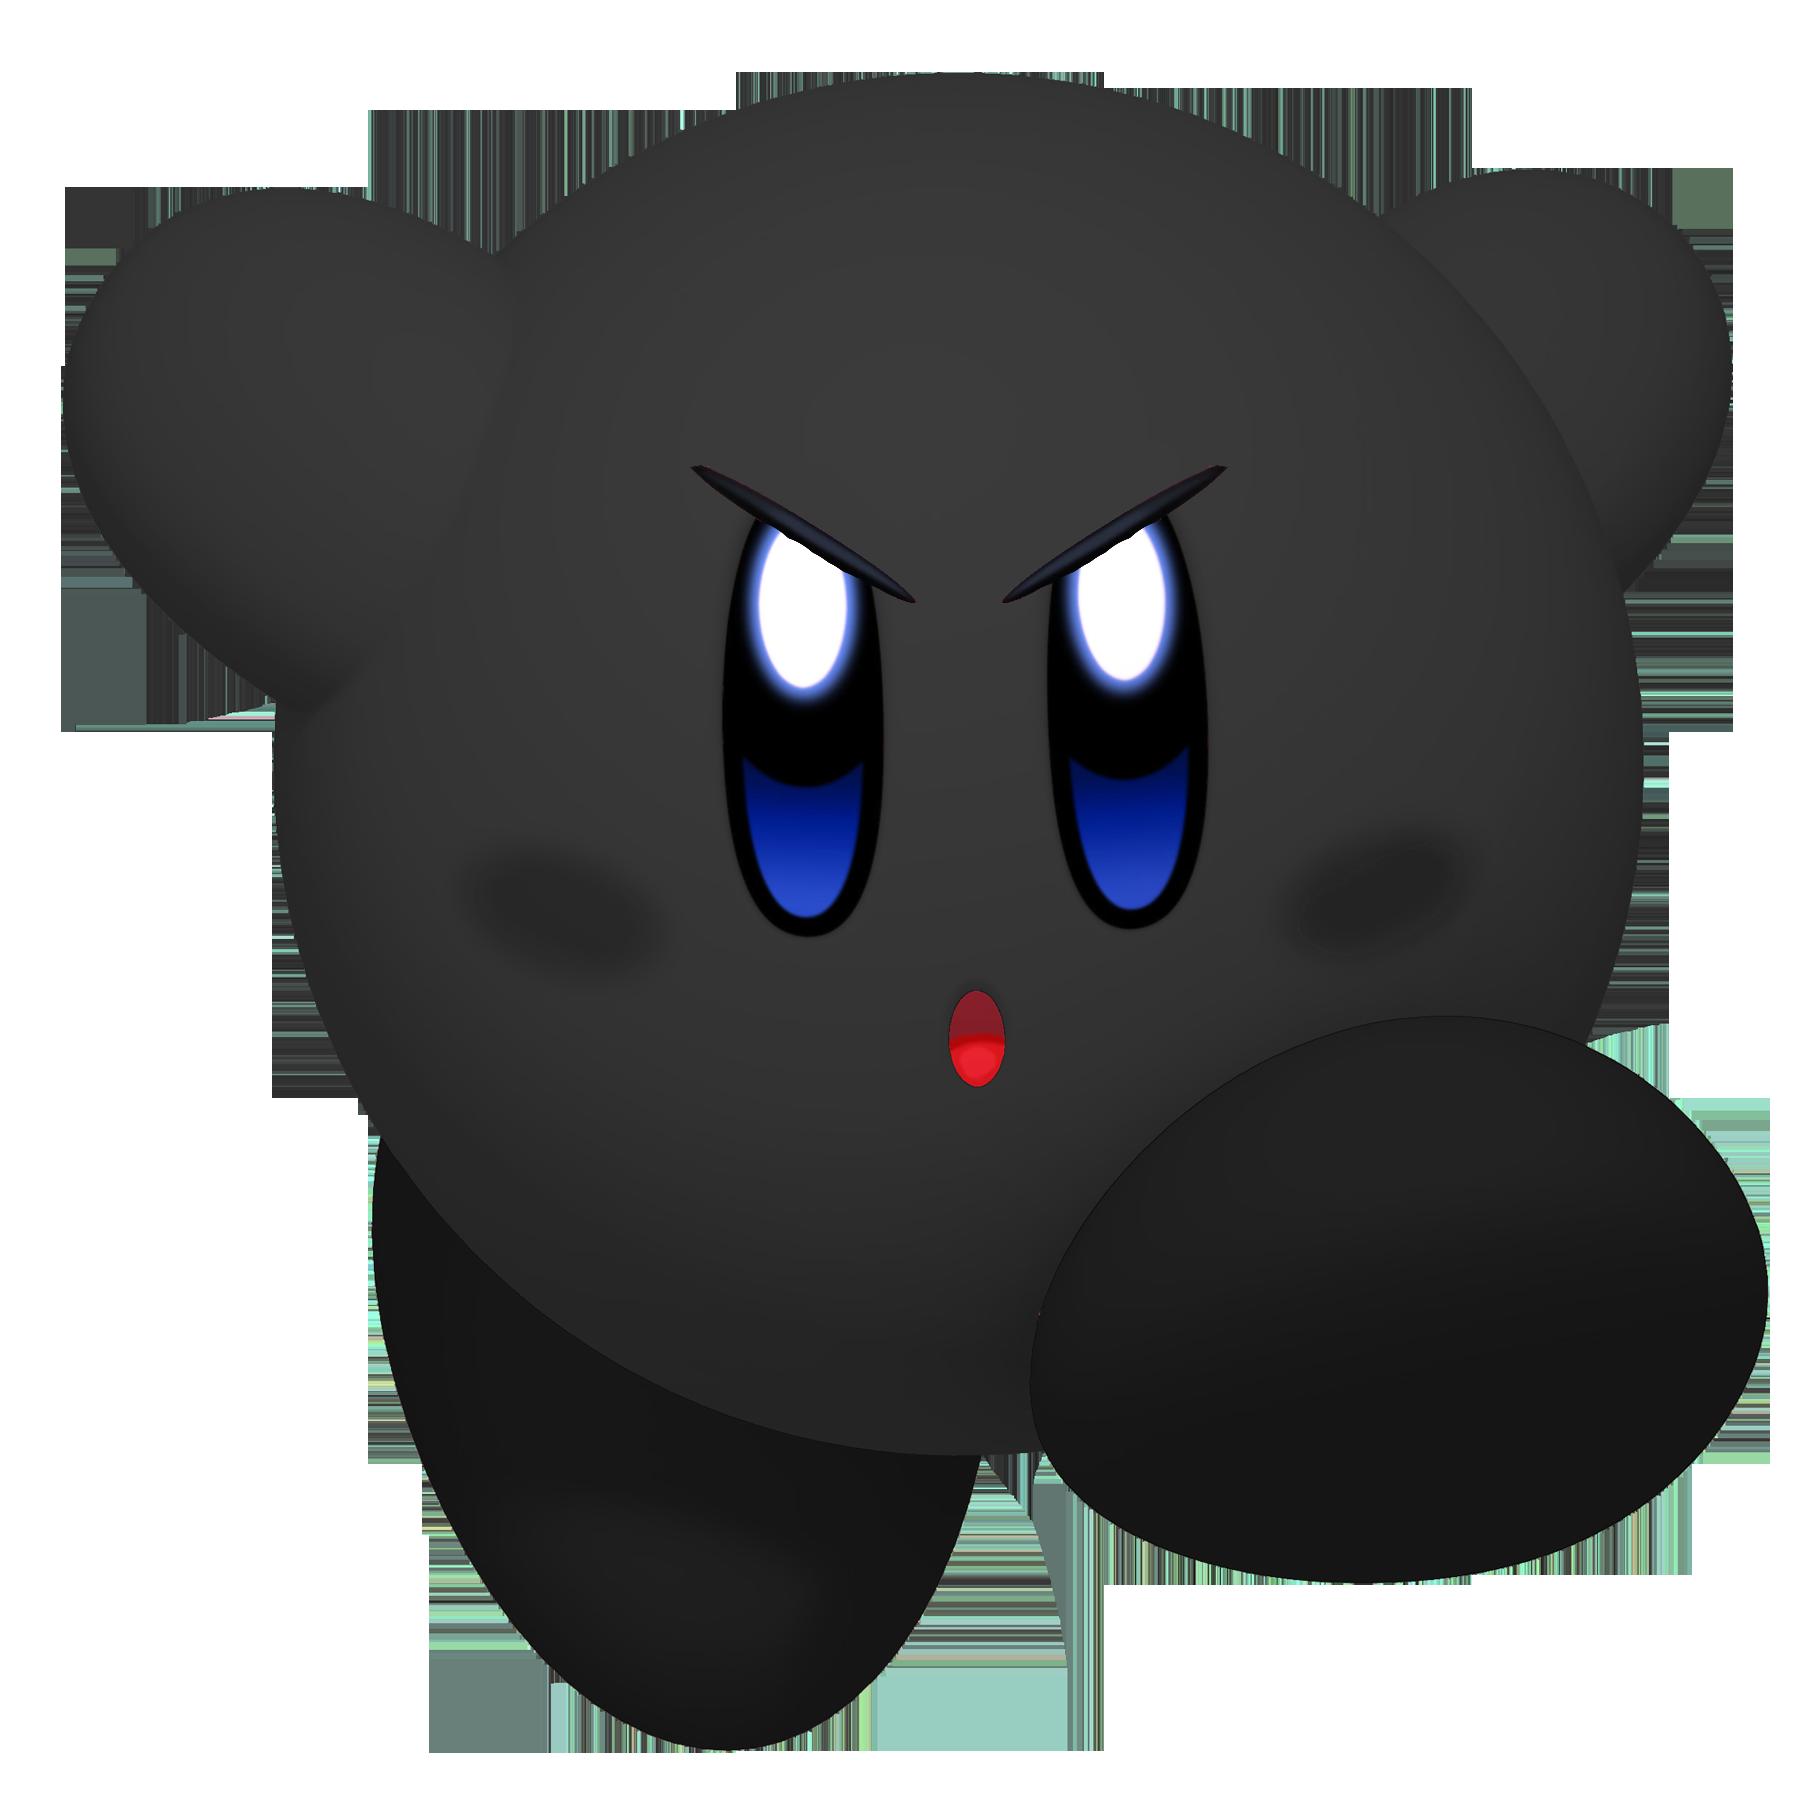 Image Shadow Kirby Kdl3d Png Fantendo Nintendo Fanon Wiki Fandom Powered By Wikia